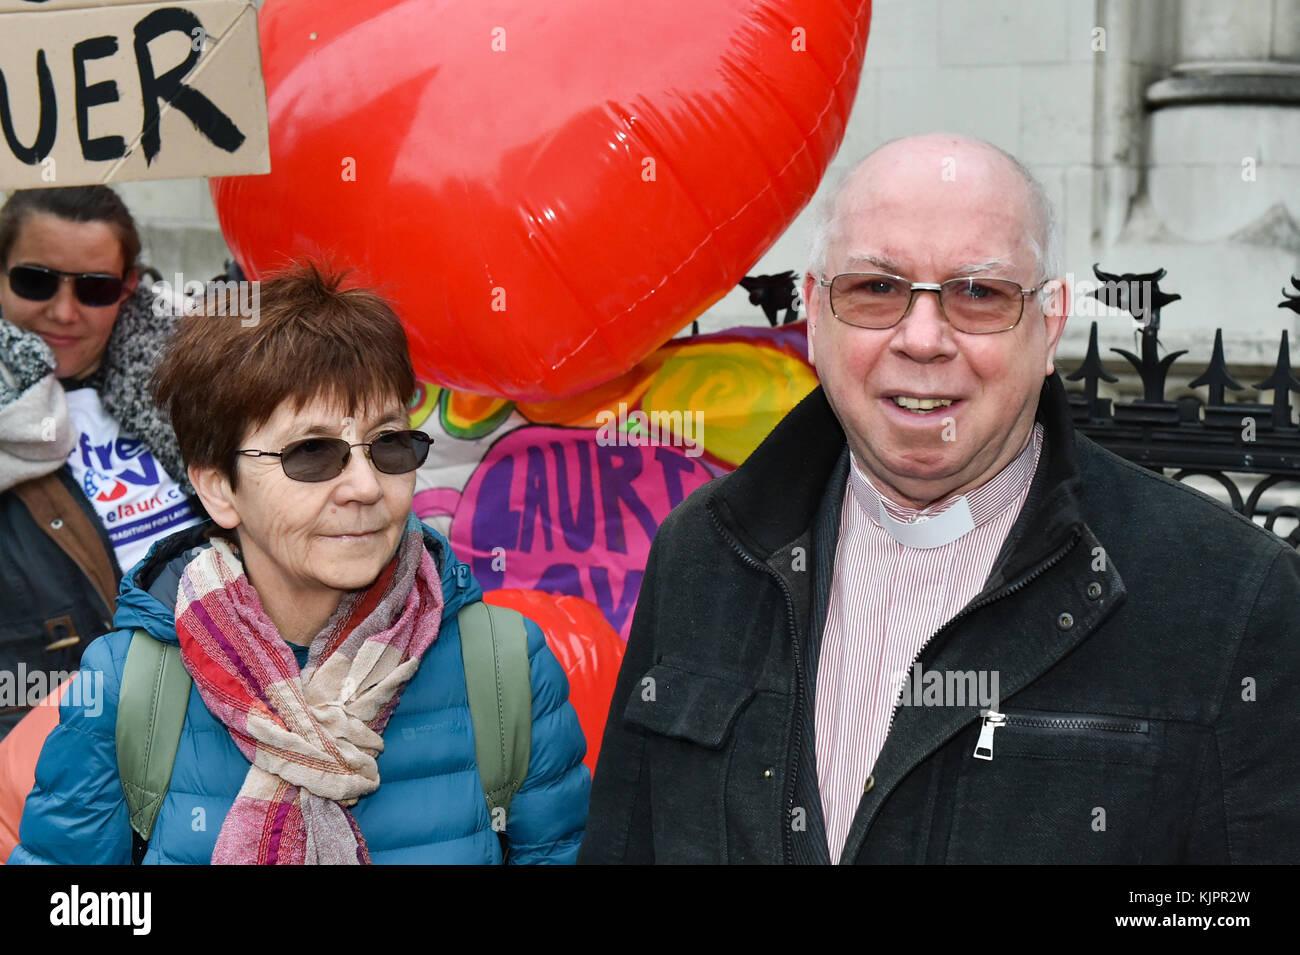 London, United Kingdom. 29 November 2017. Reverend Alexander Love and Sirkka-Liisa Love outside the Royal Courts - Stock Image